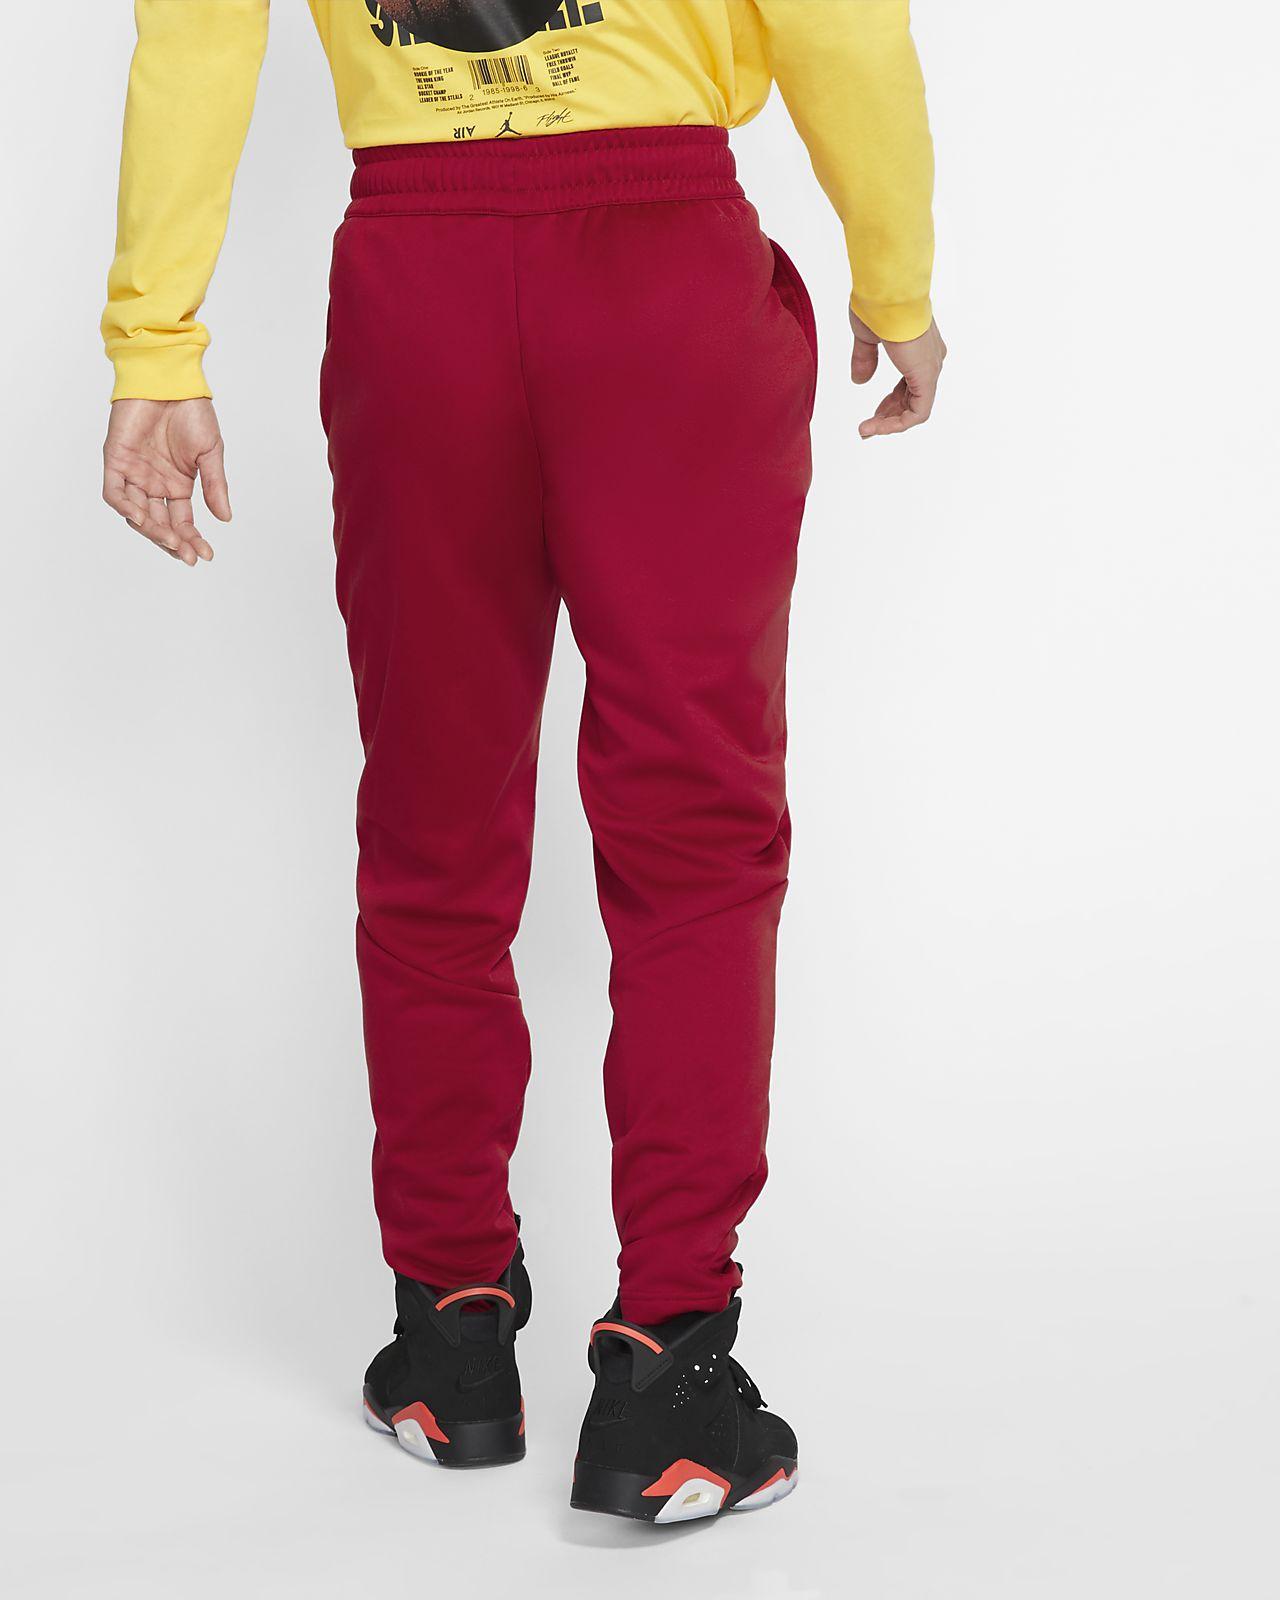 Pantalon en tissu Fleece Jordan 23 Alpha Therma pour Homme